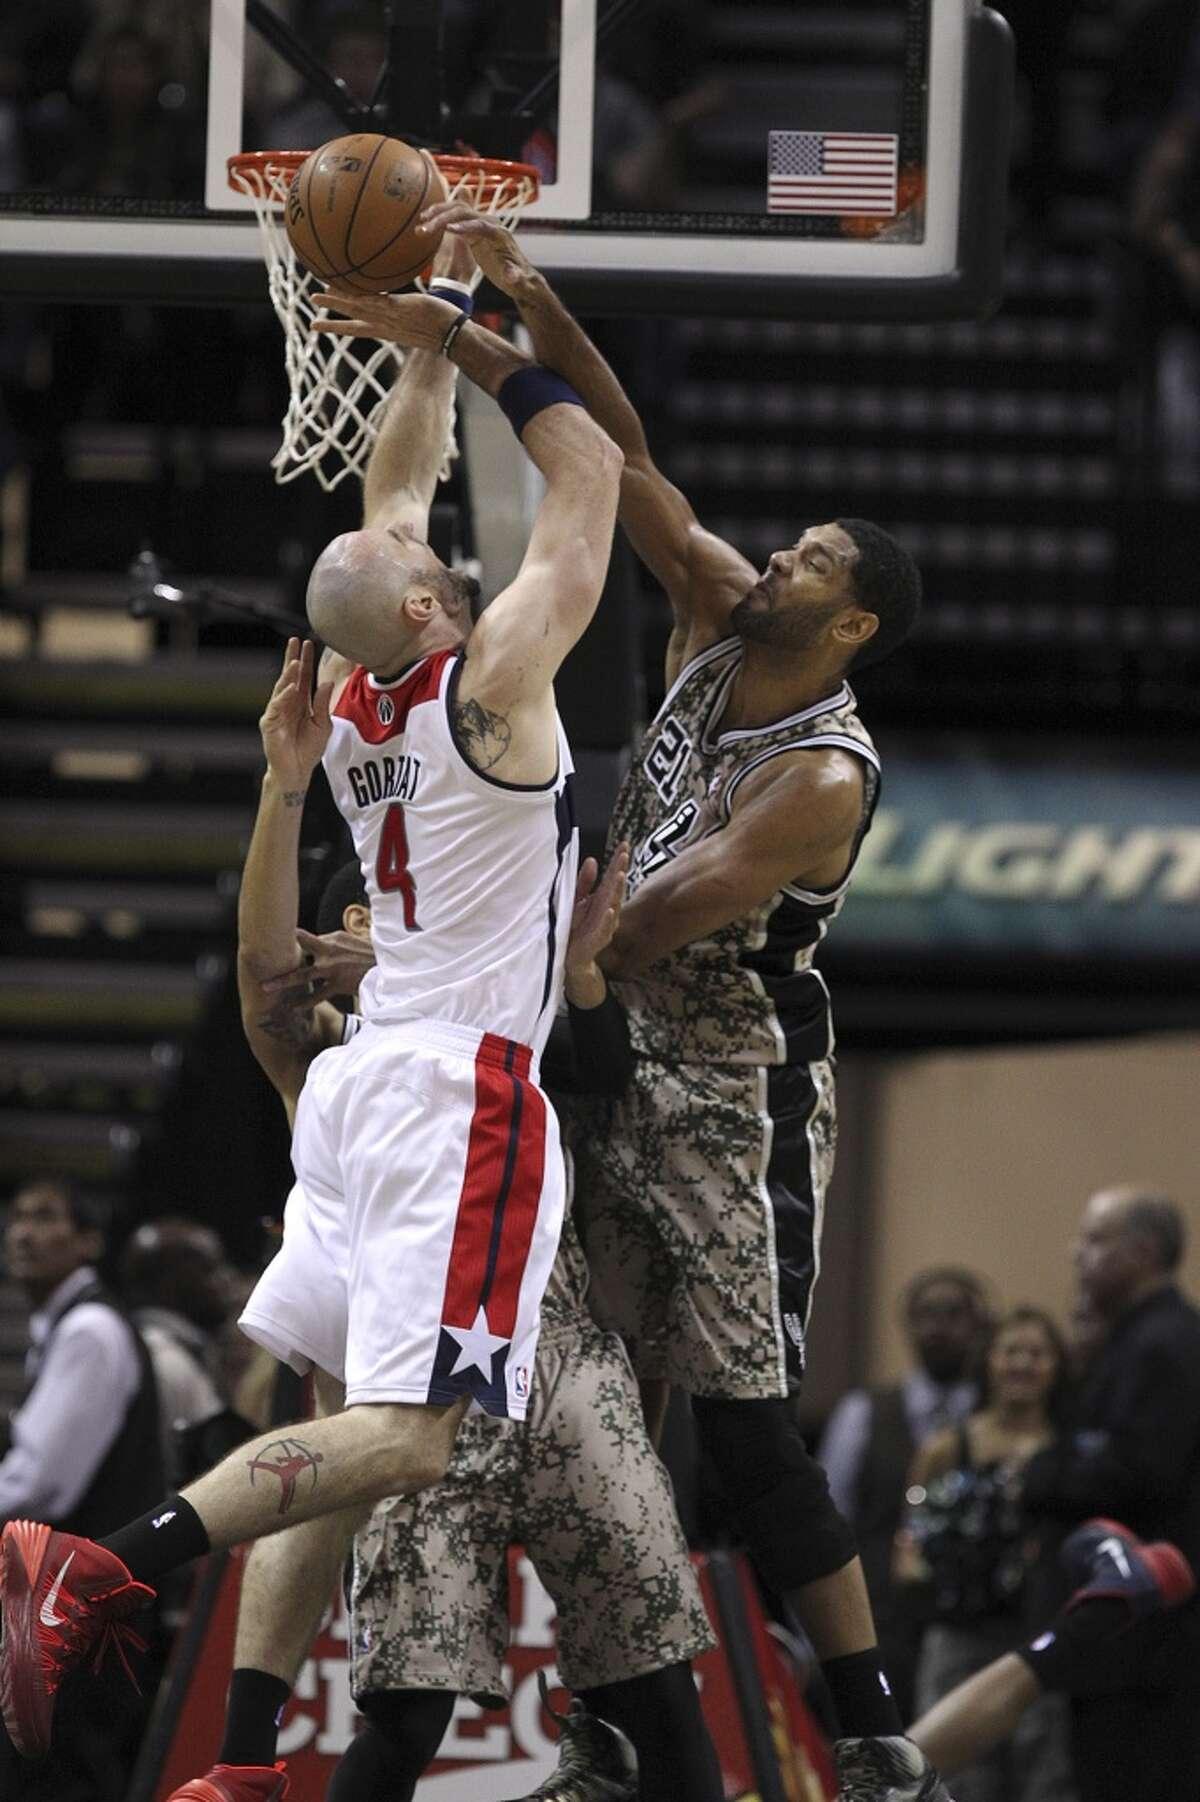 Nov. 13, 2013: Spurs 92, Wizards 79San Antonio Spurs' Tim Duncan fouls Washington Wizards' Marcin Gortat during the first half at the AT&T Center, Wednesday, Nov. 13, 2013.